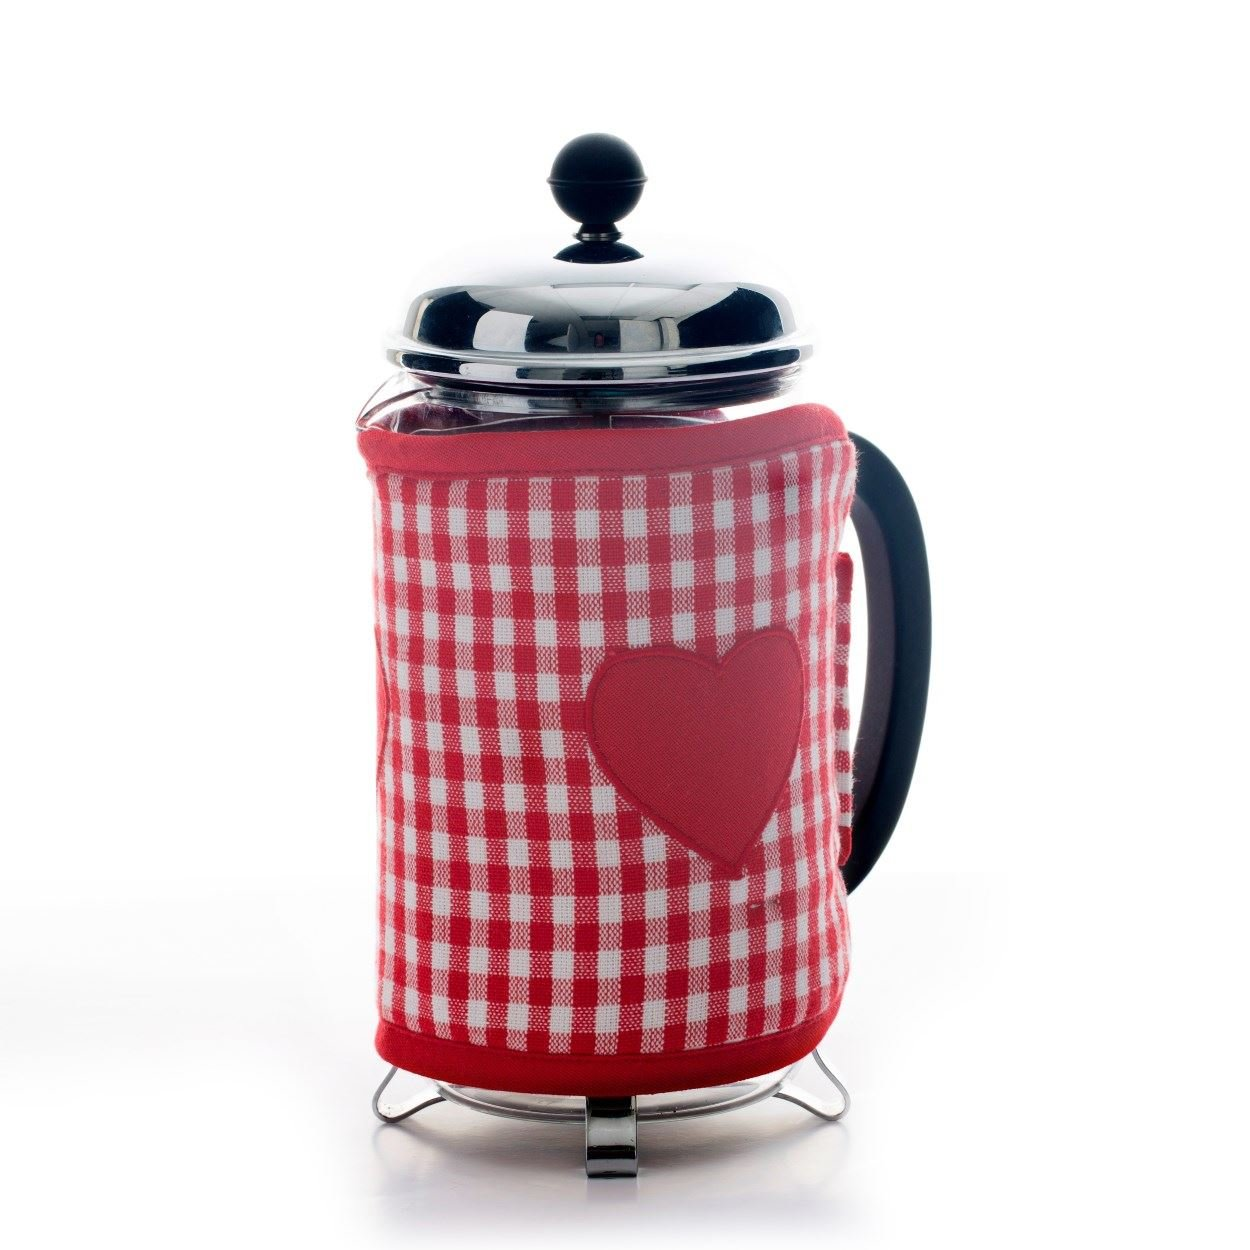 Dexam Vintage Home Claret Red Cafetiere Cosy - 6 & 8 Cup 16150203